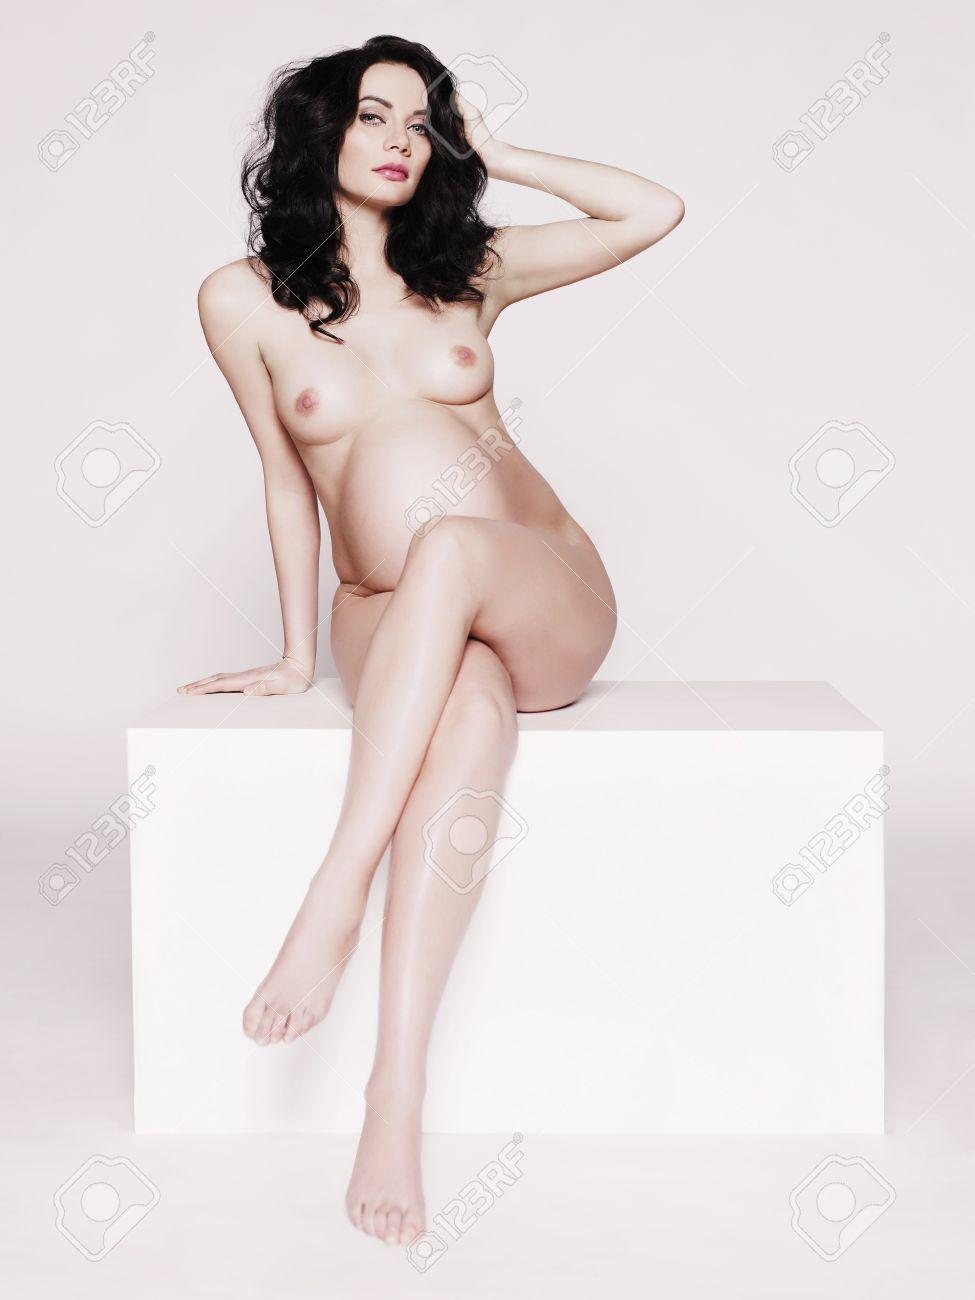 sexey-moive-pregnant-nude-pics-fucking